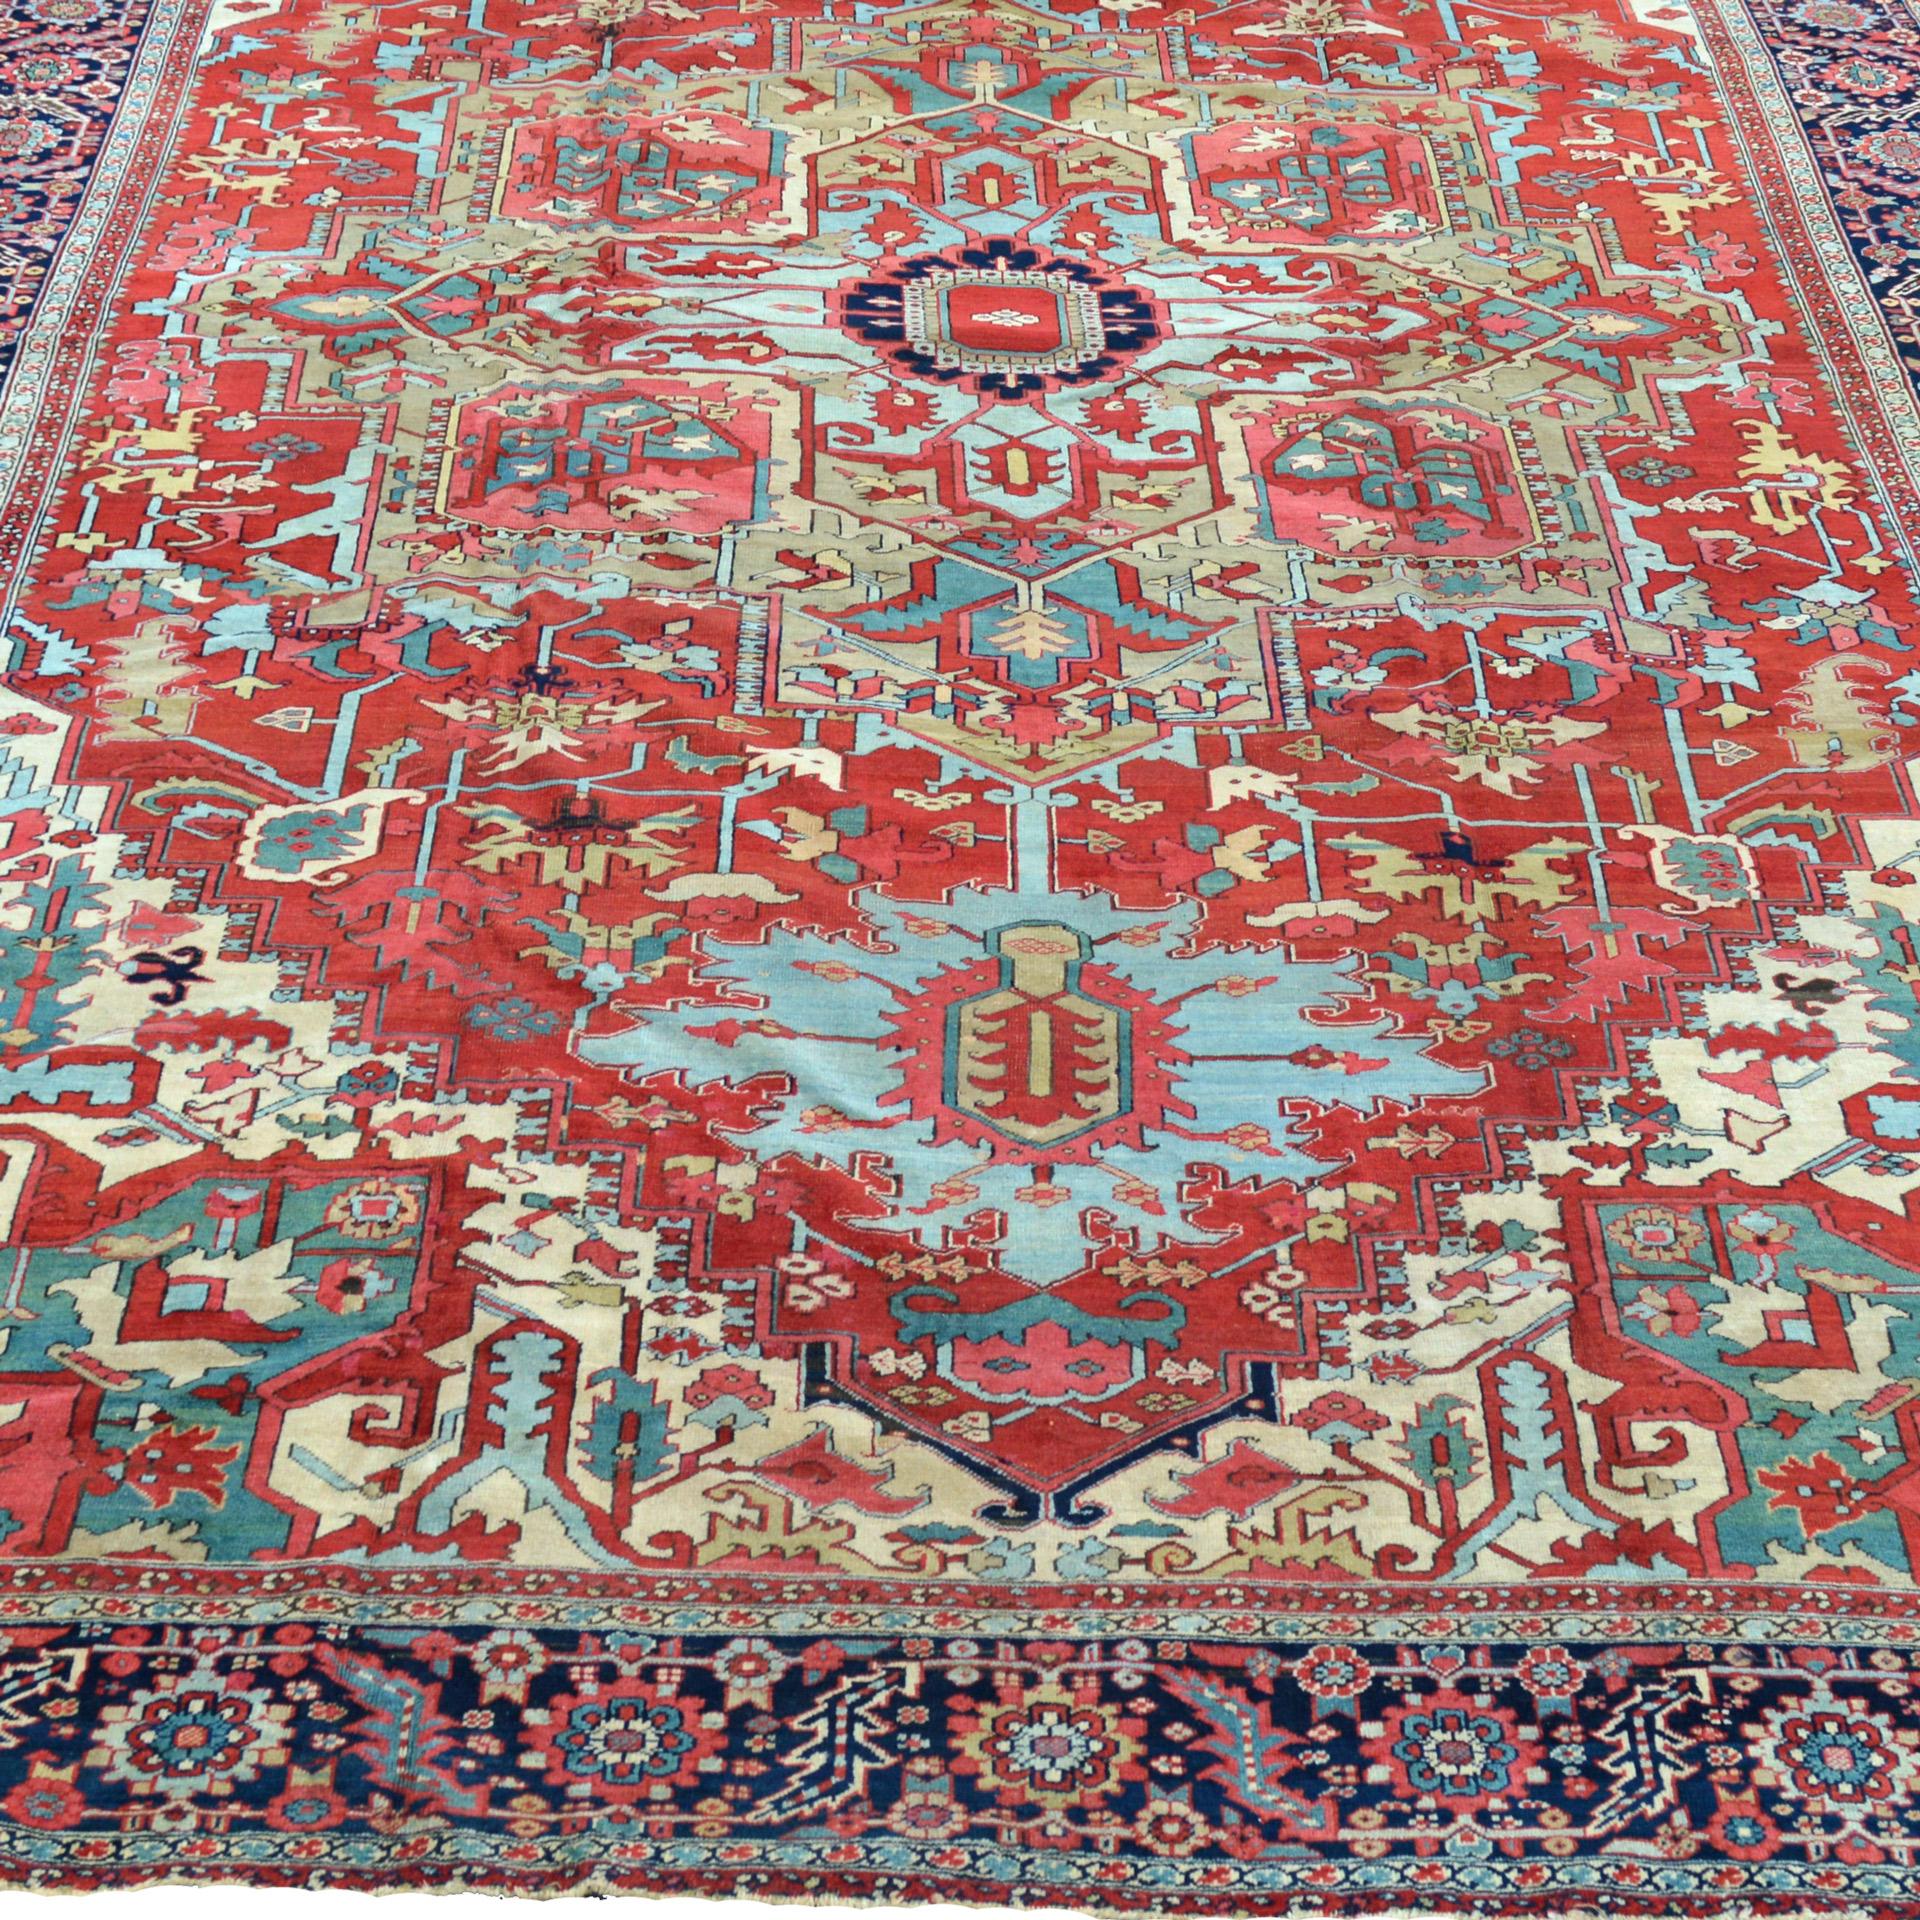 11.9 x 17.4 Antique Heriz Serapi carpet